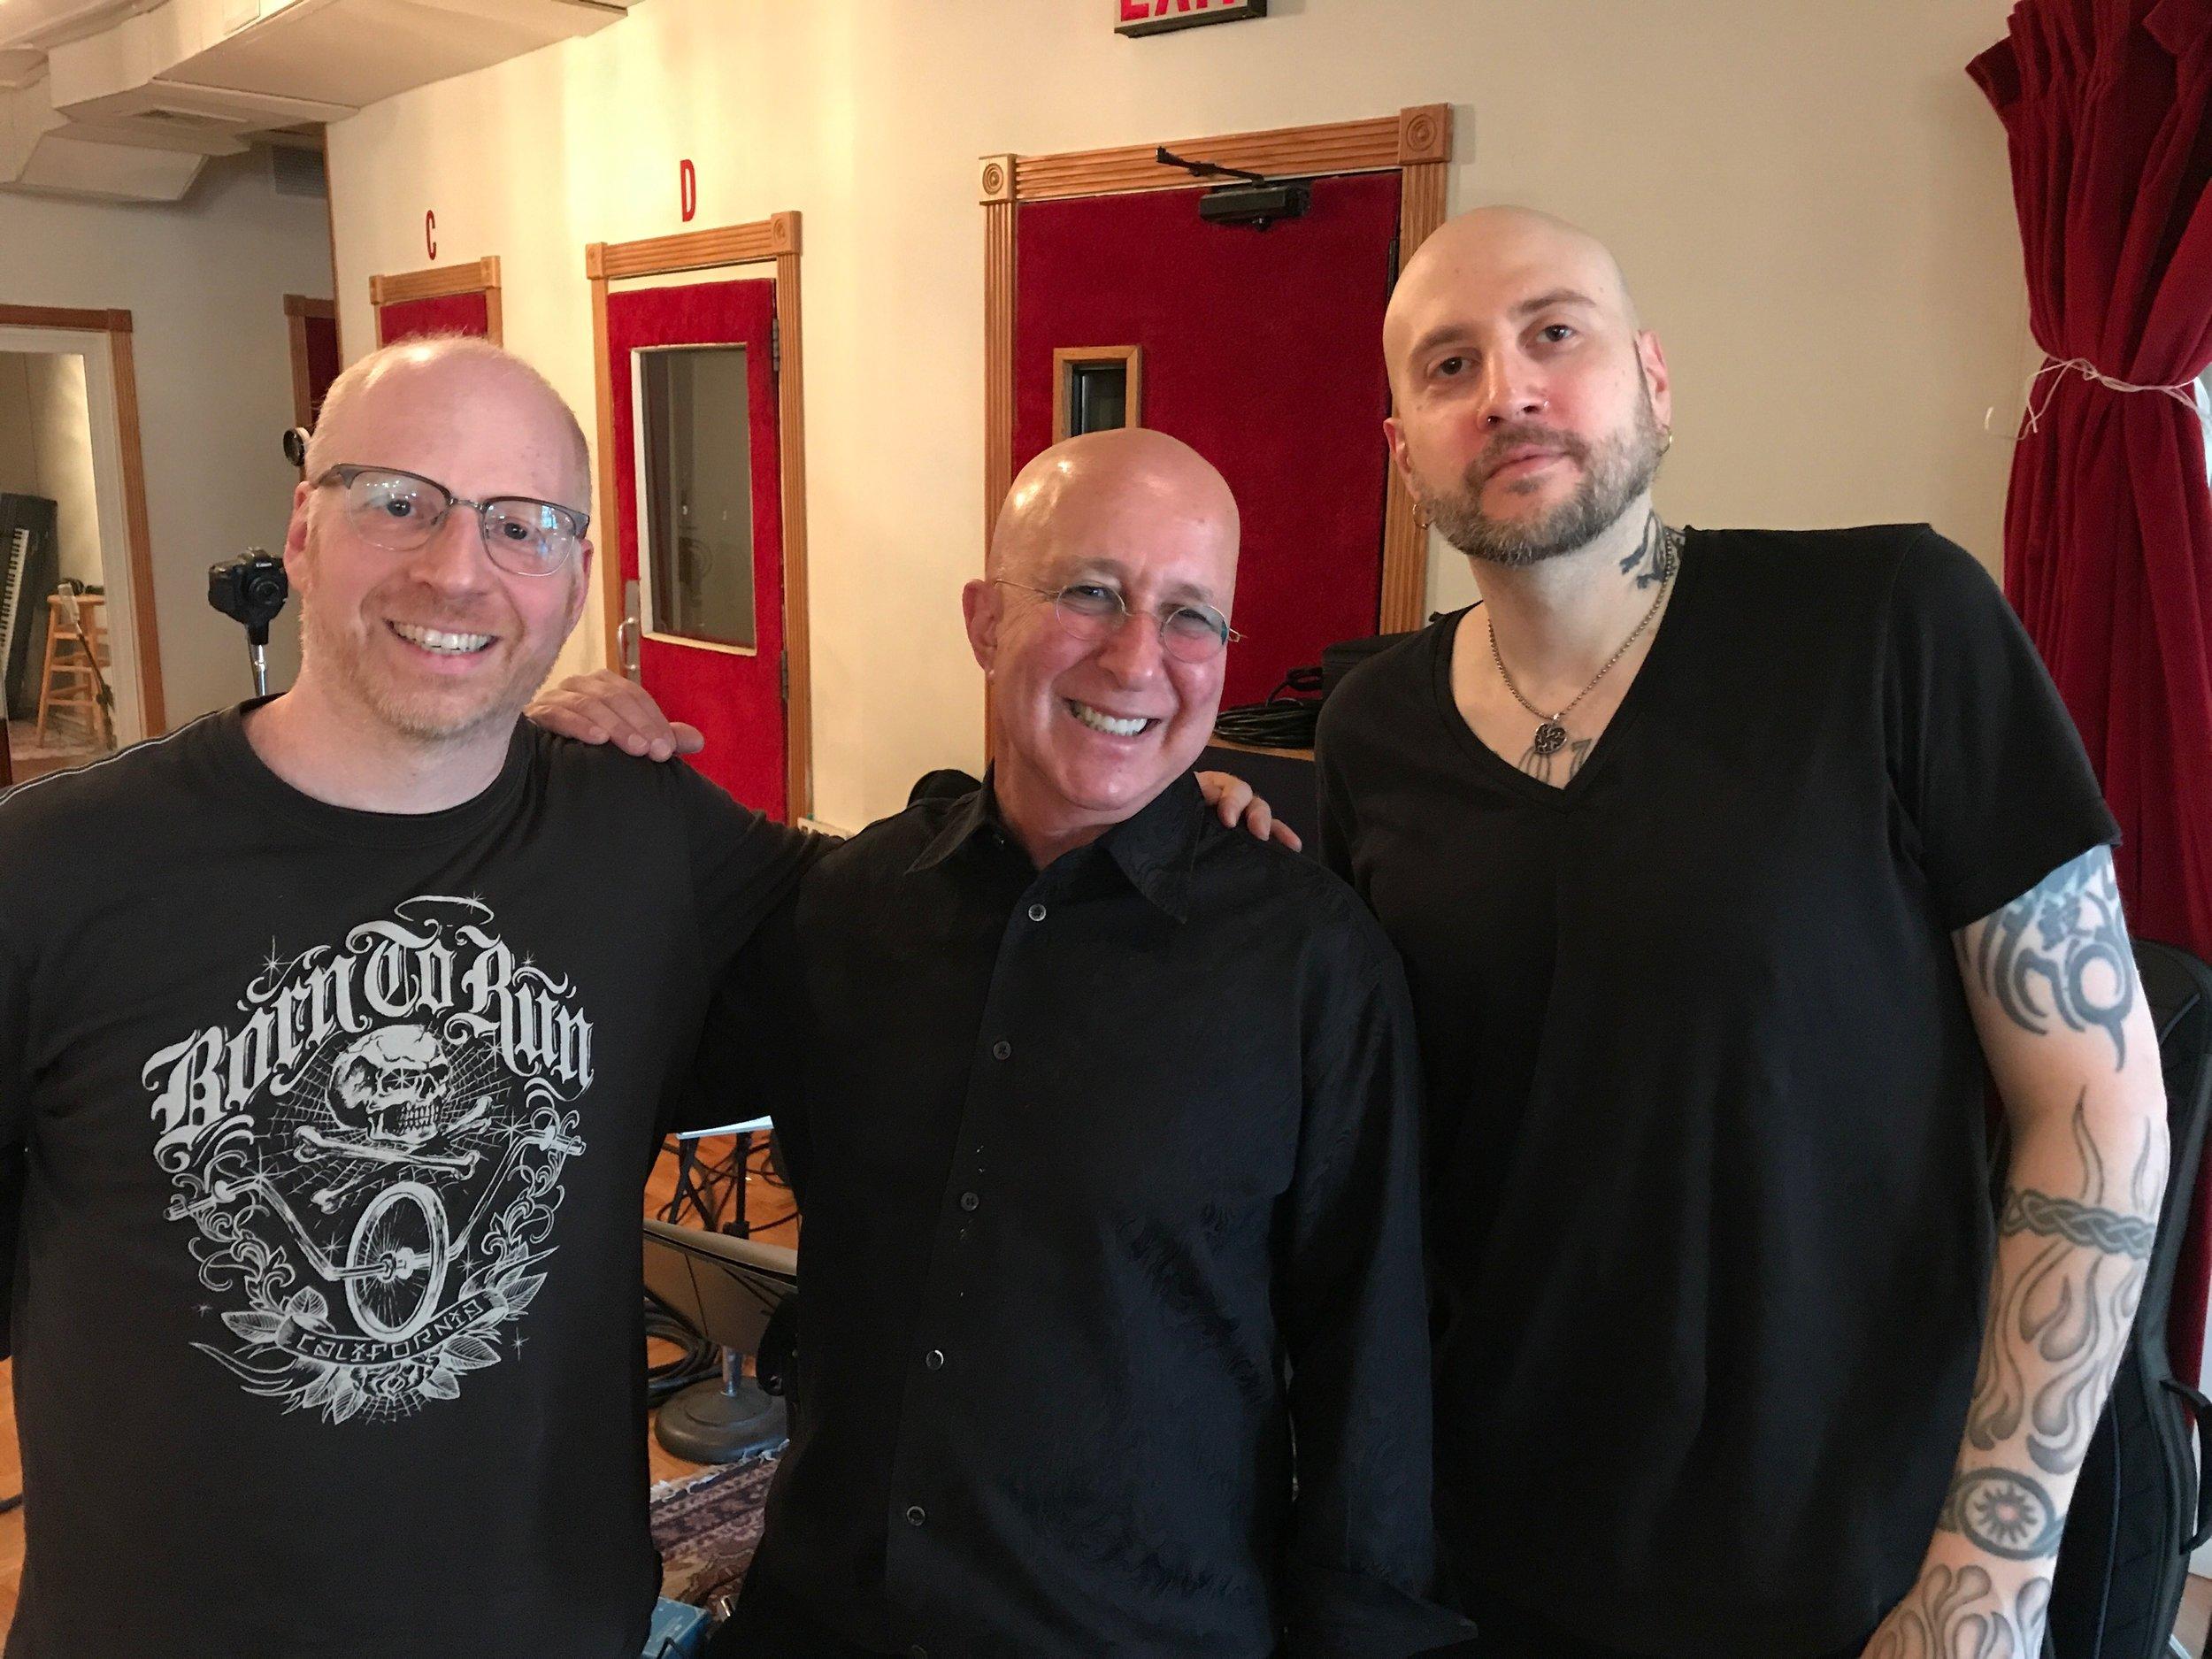 Oz Noy, Paul Shaffer, Stephen Wolf (3 bald jews!)